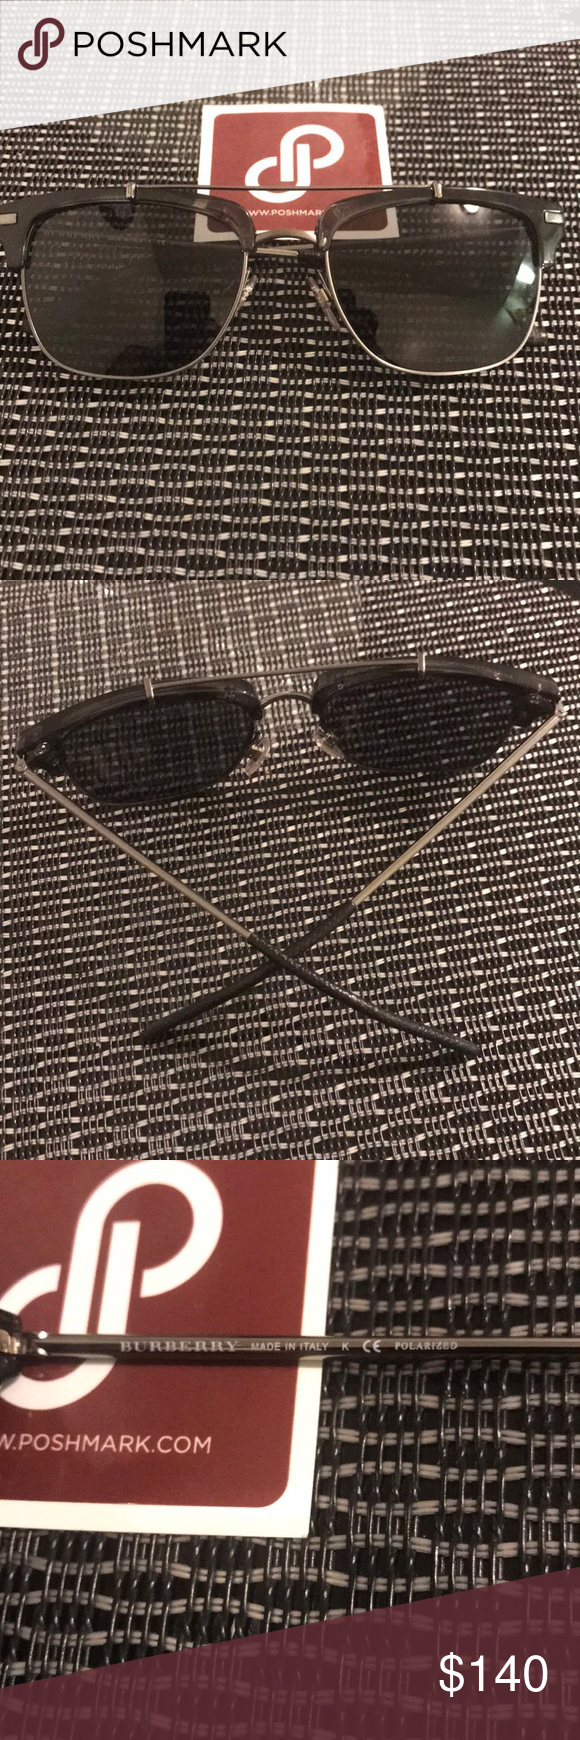 2df55eb1b16b Burberry Metal Frame Sunglasses 🕶 Authentic Unisex Model B 4202-Q Non  Burberry Case included Burberry Accessories Sunglasses